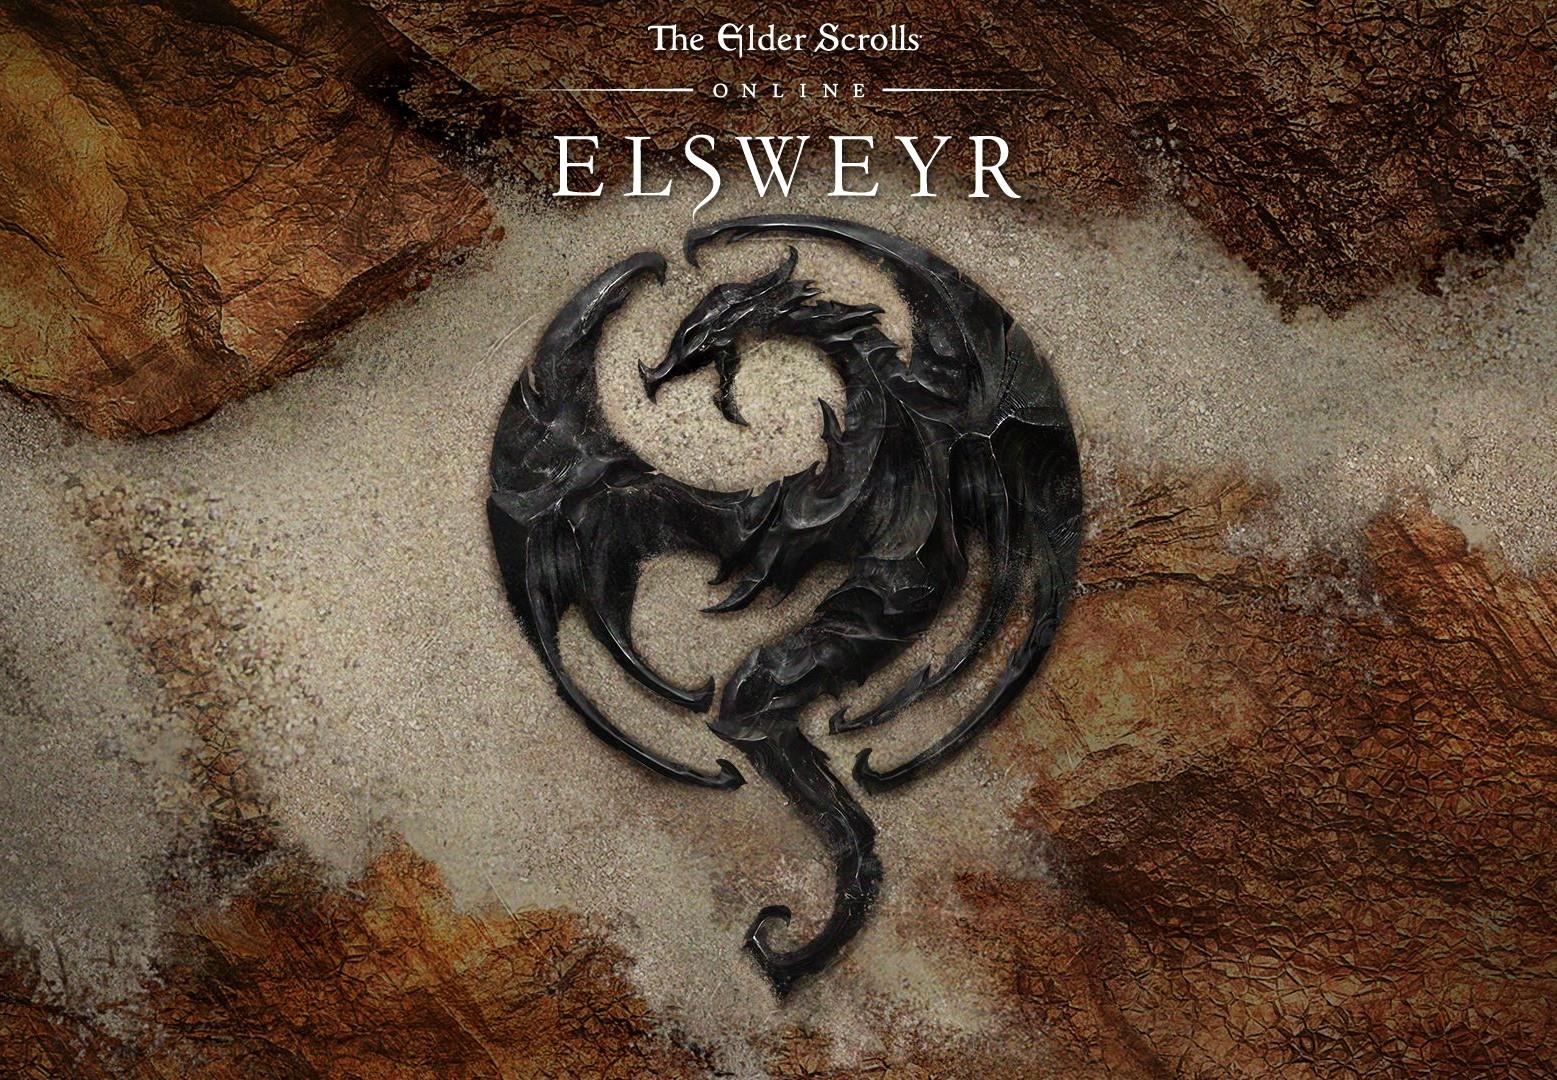 The Elder Scrolls Online: Elsweyr Standard EMEA Digital Download CD Key